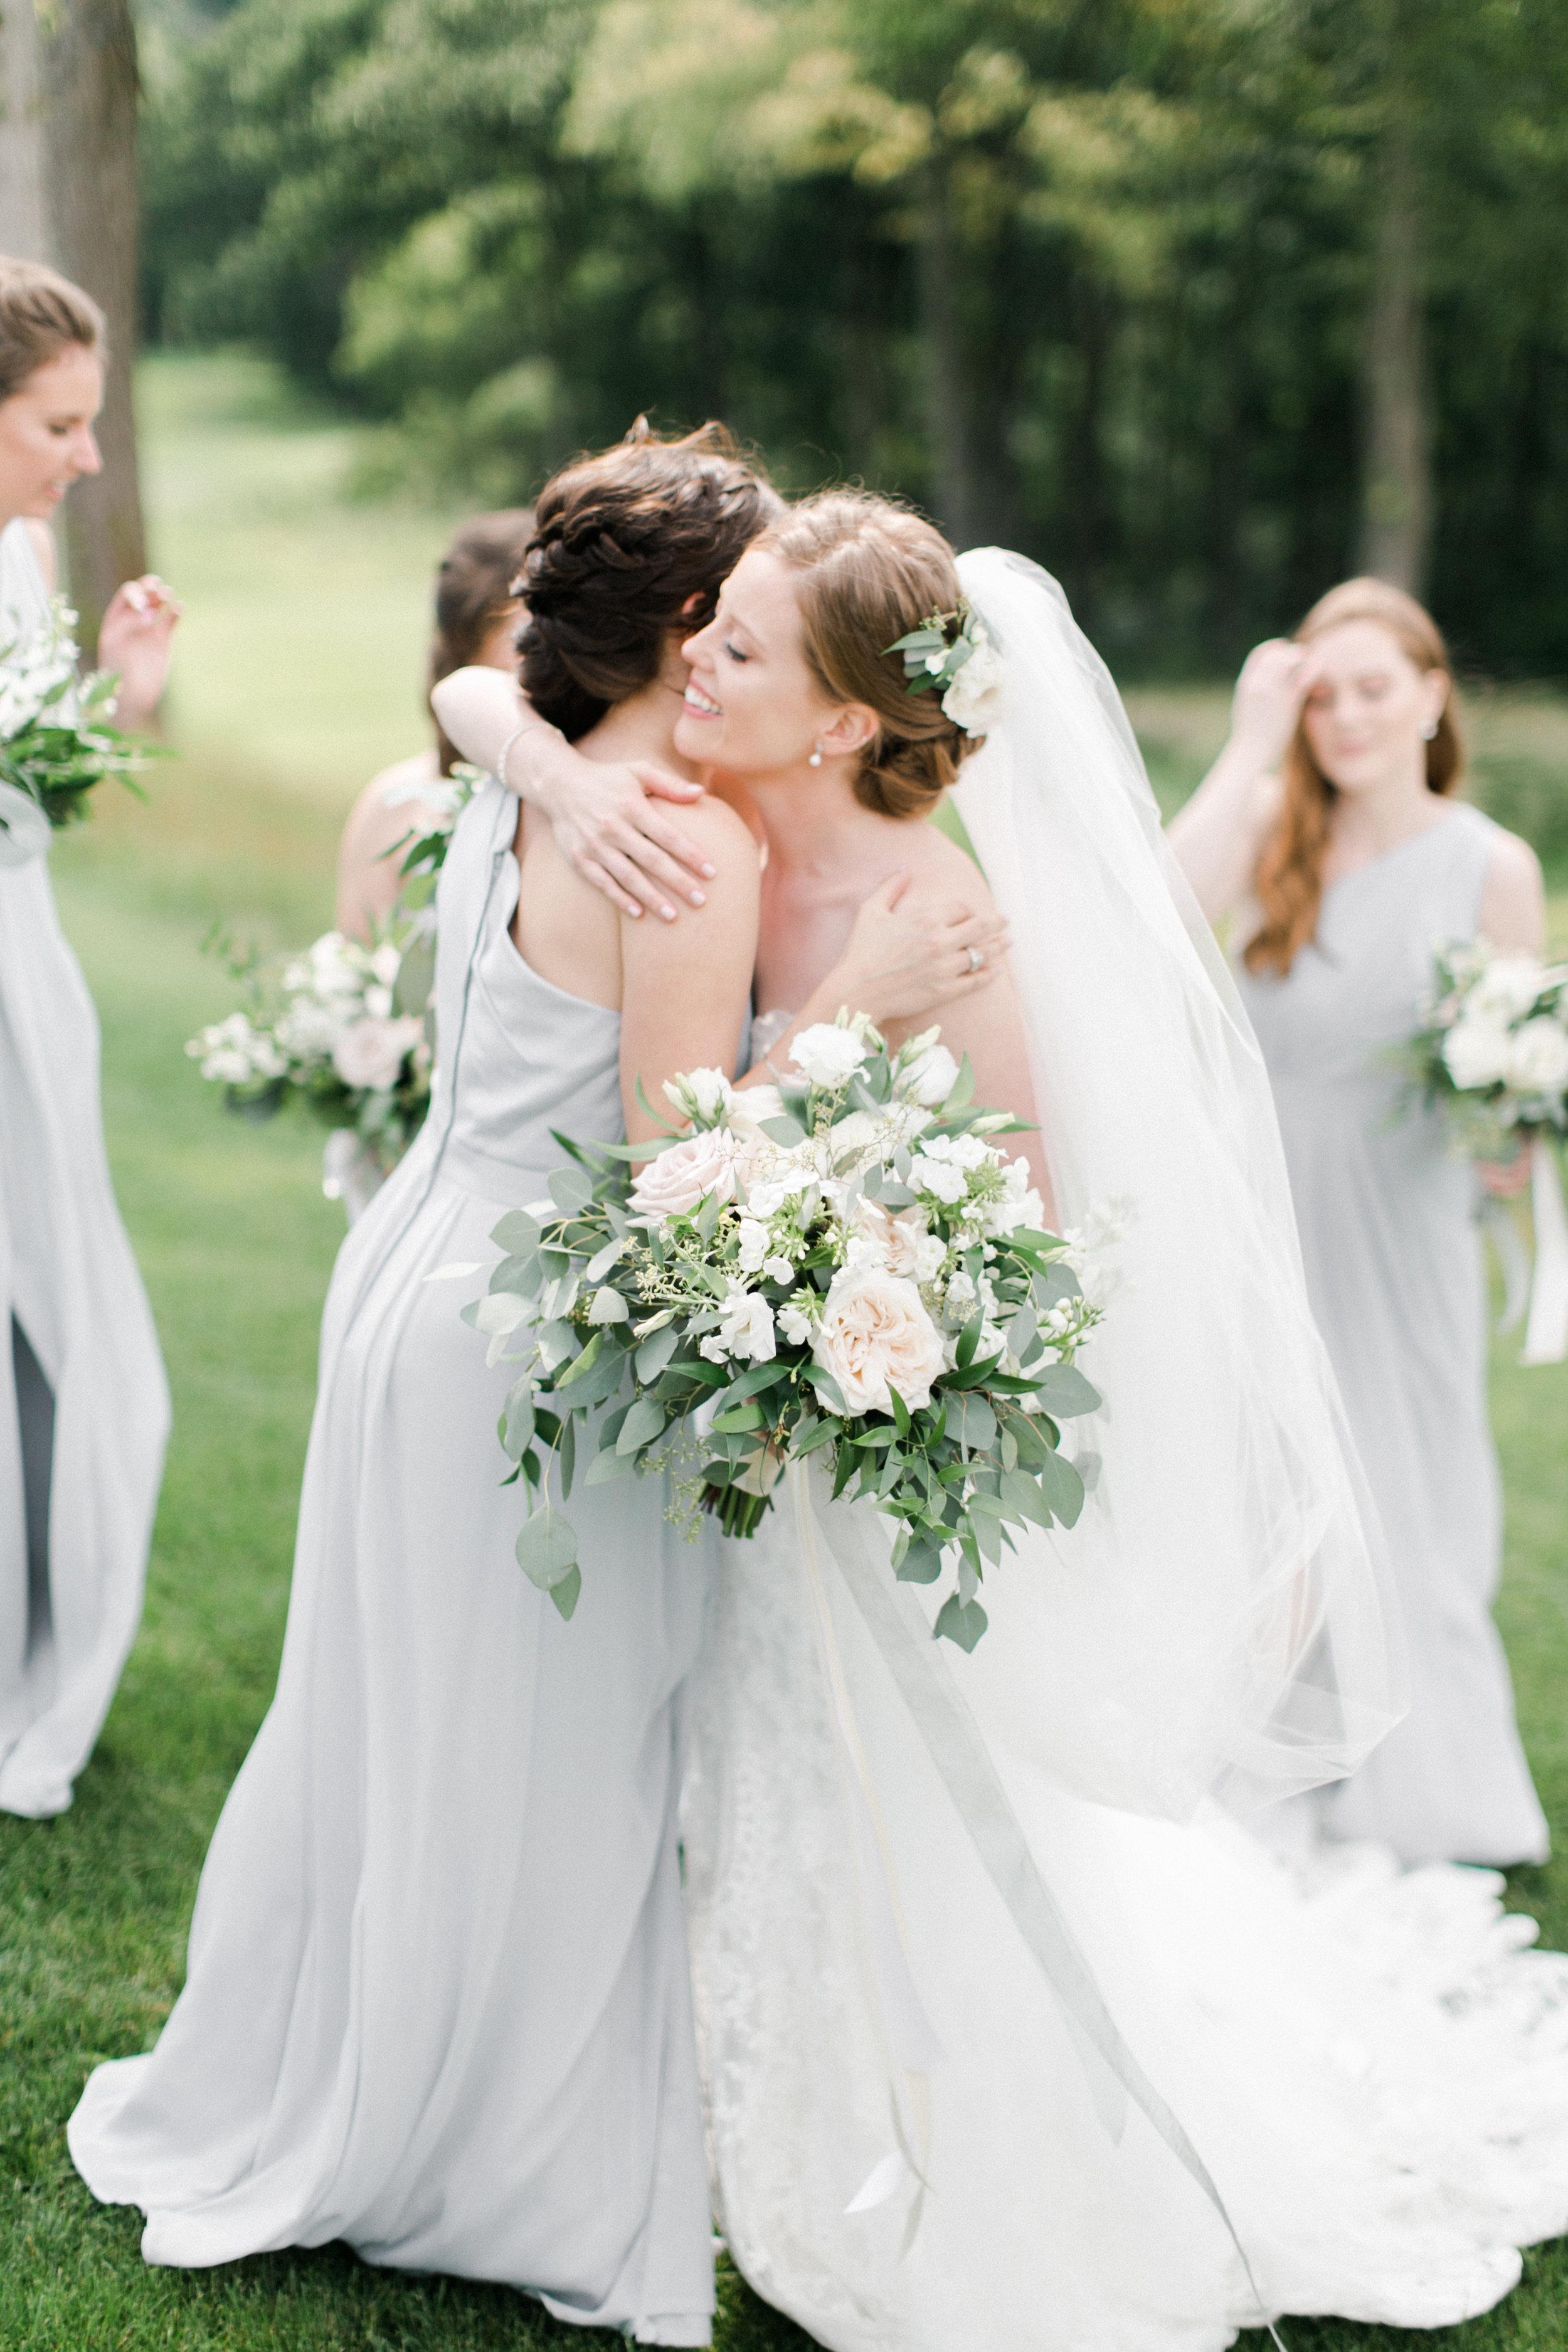 london-hunt-club-toronto-wedding-photographer-bright-richelle-hunter-jewish-ceremony-jessica-shemer-257.jpg